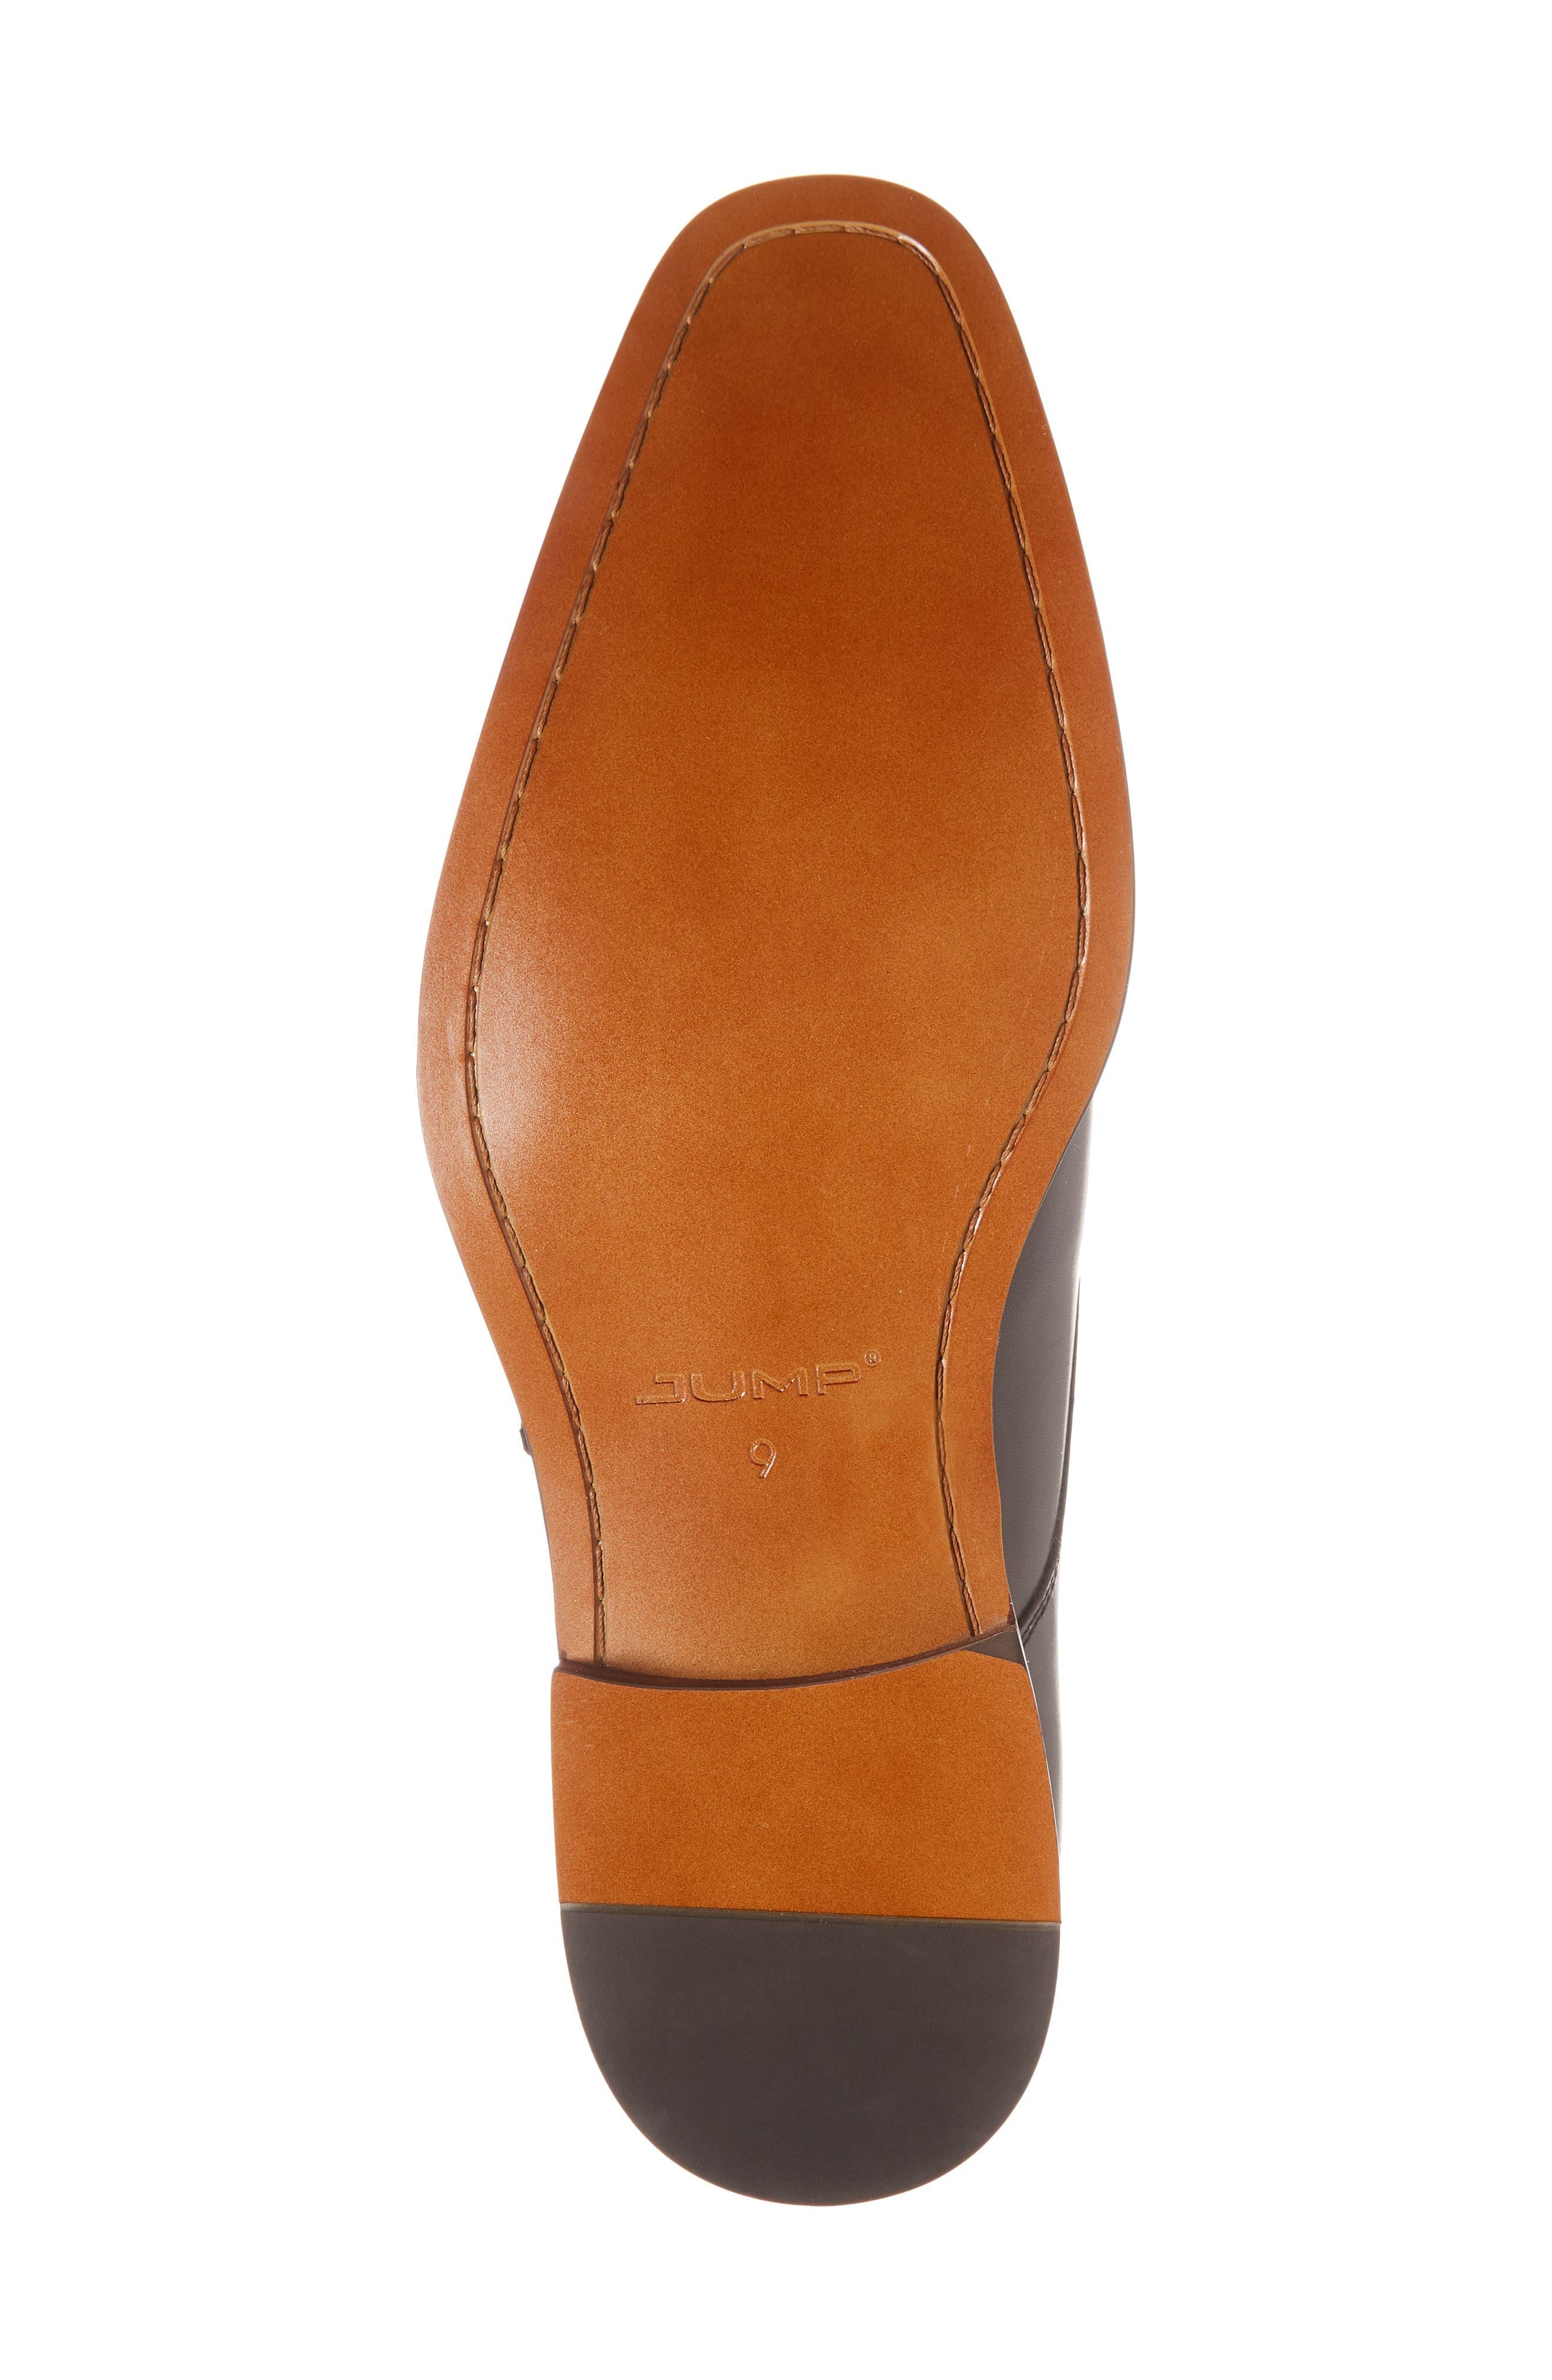 Merlot Single Buckle Monk Shoe,                             Alternate thumbnail 6, color,                             BLACK LEATHER